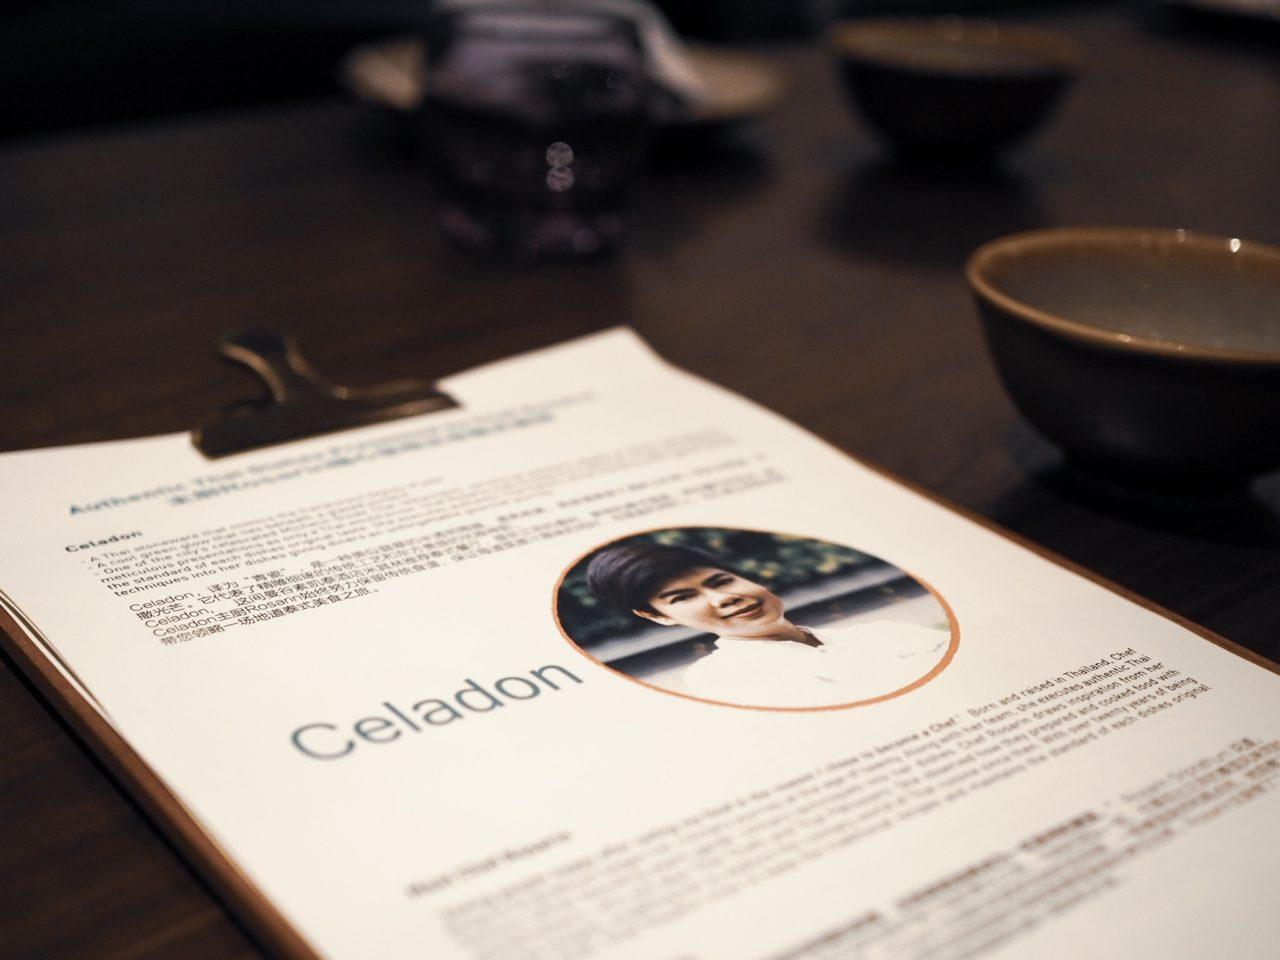 img 2920 1 1 - URBAN Cafe - スコータイ上海で味わう本場タイの味!期間限定メニューのご紹介